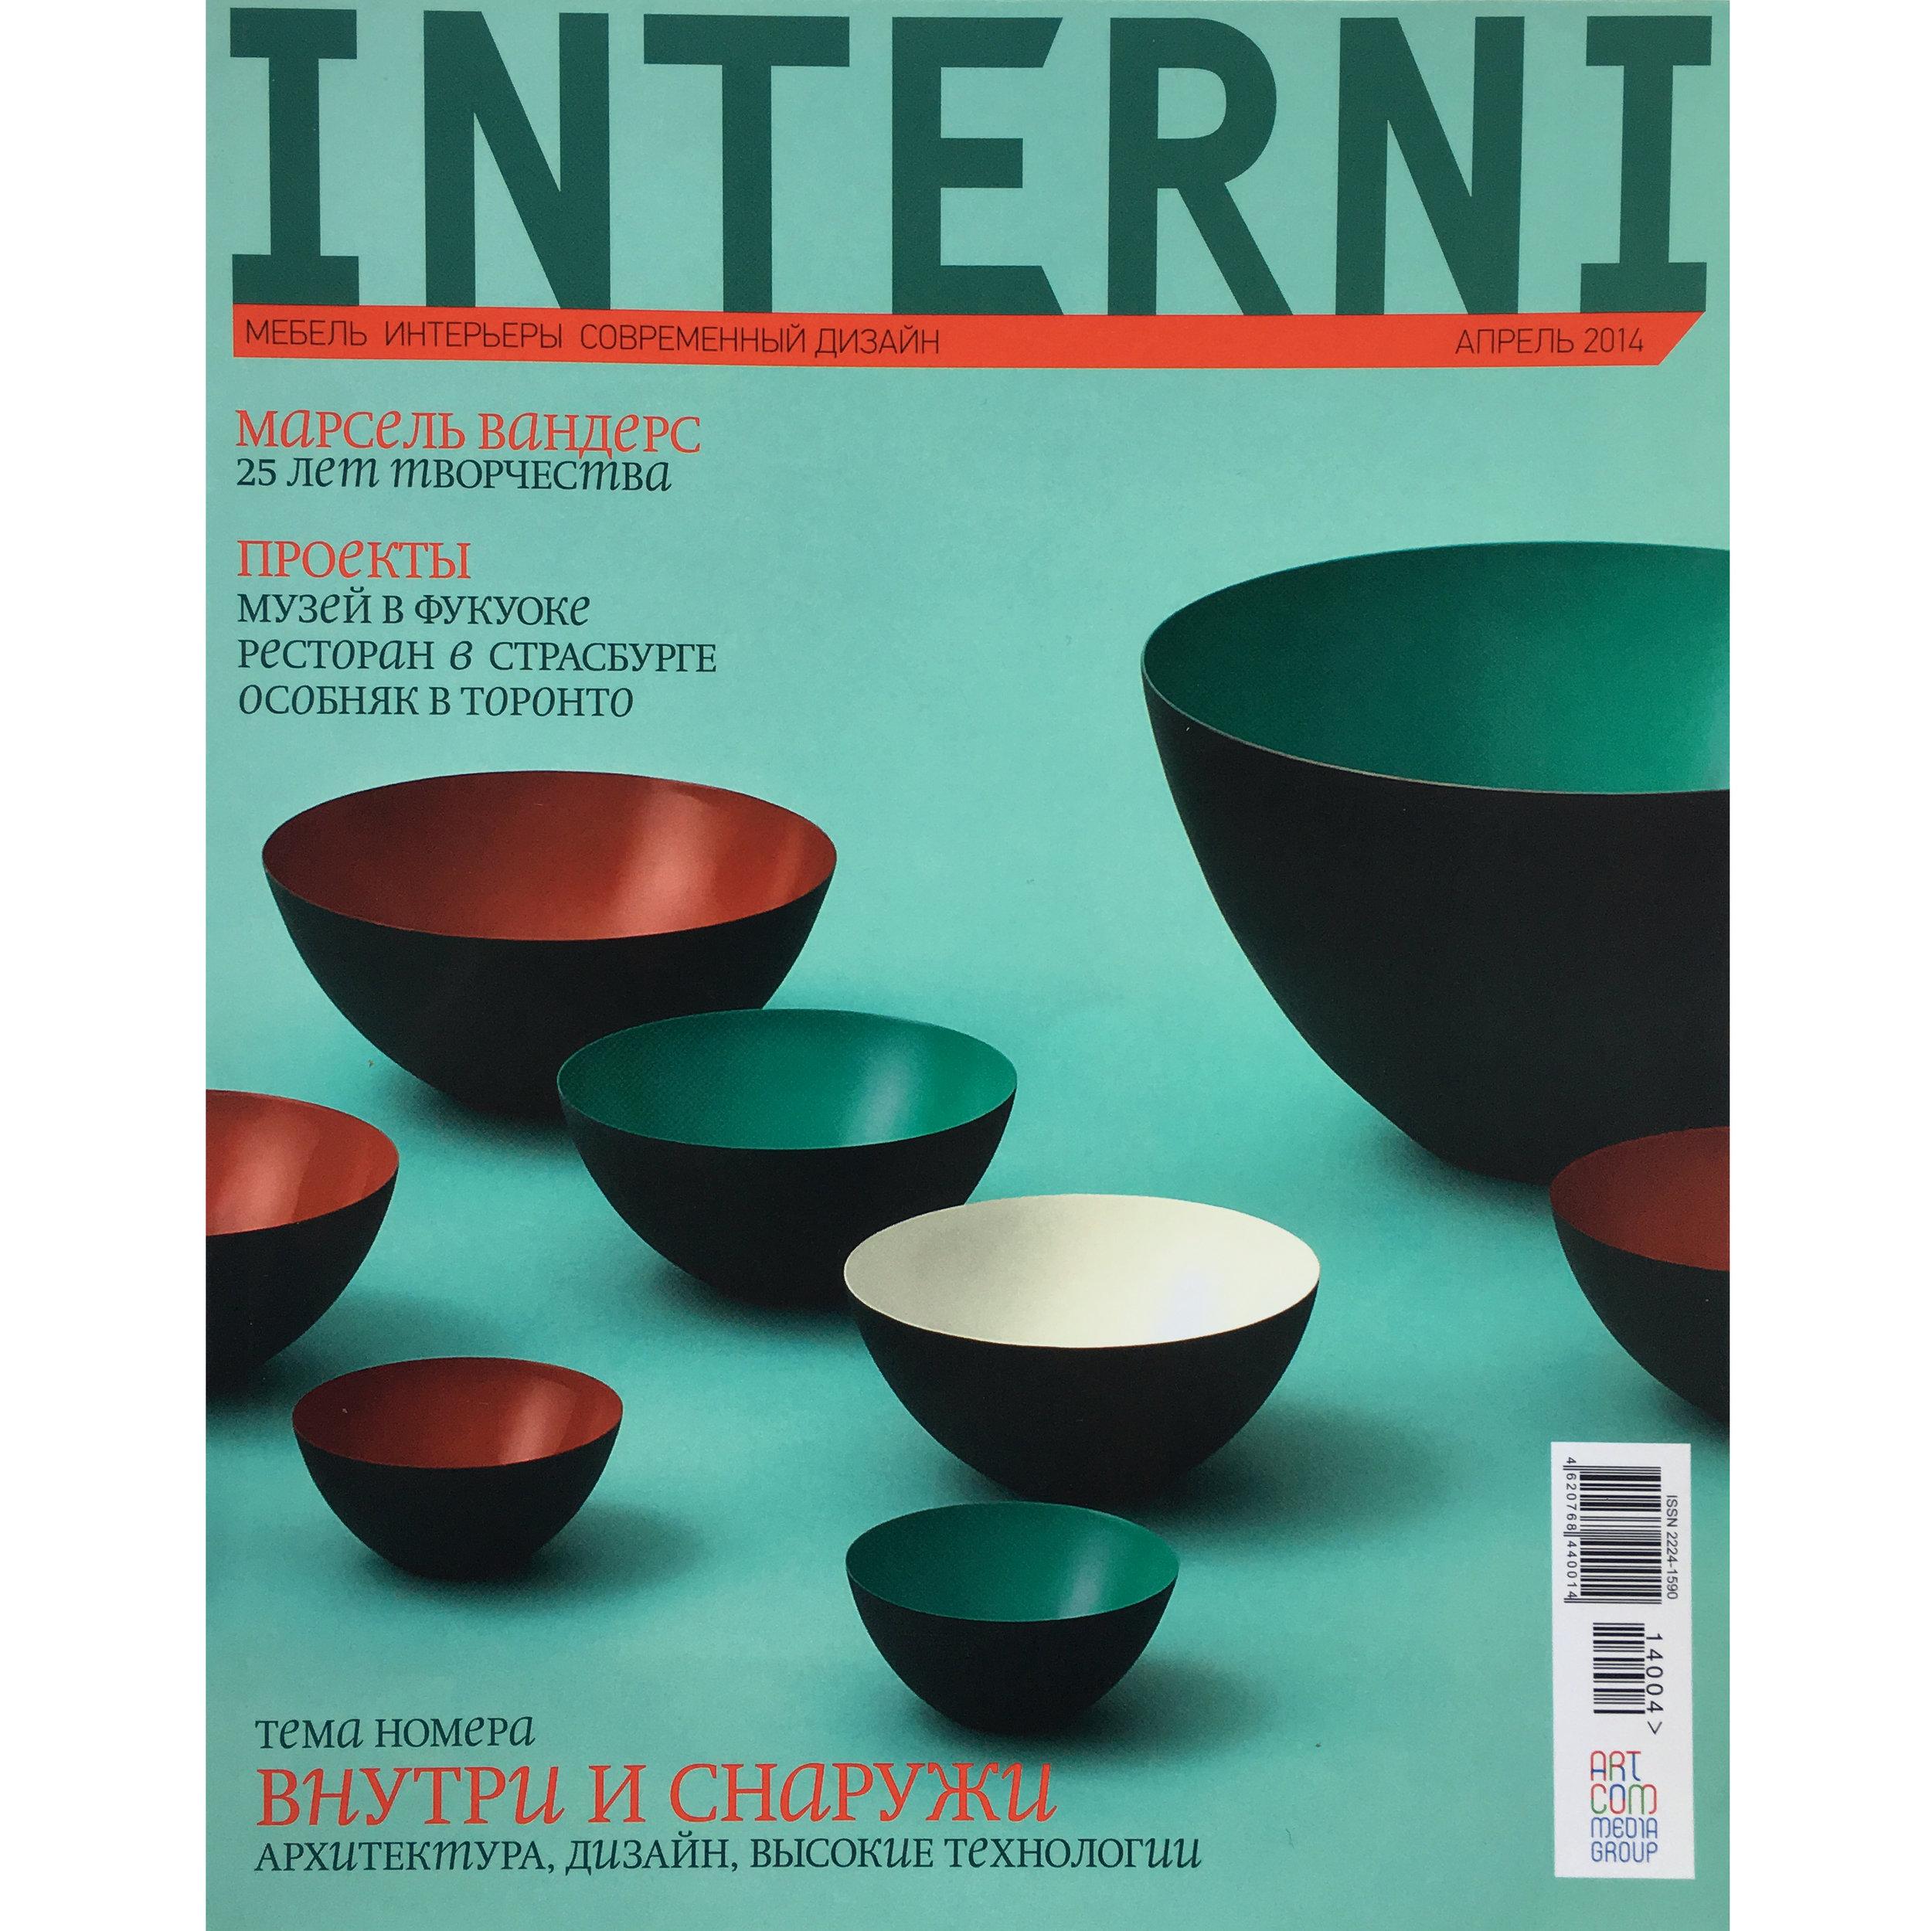 Interni. 2014 (Printed Publication)